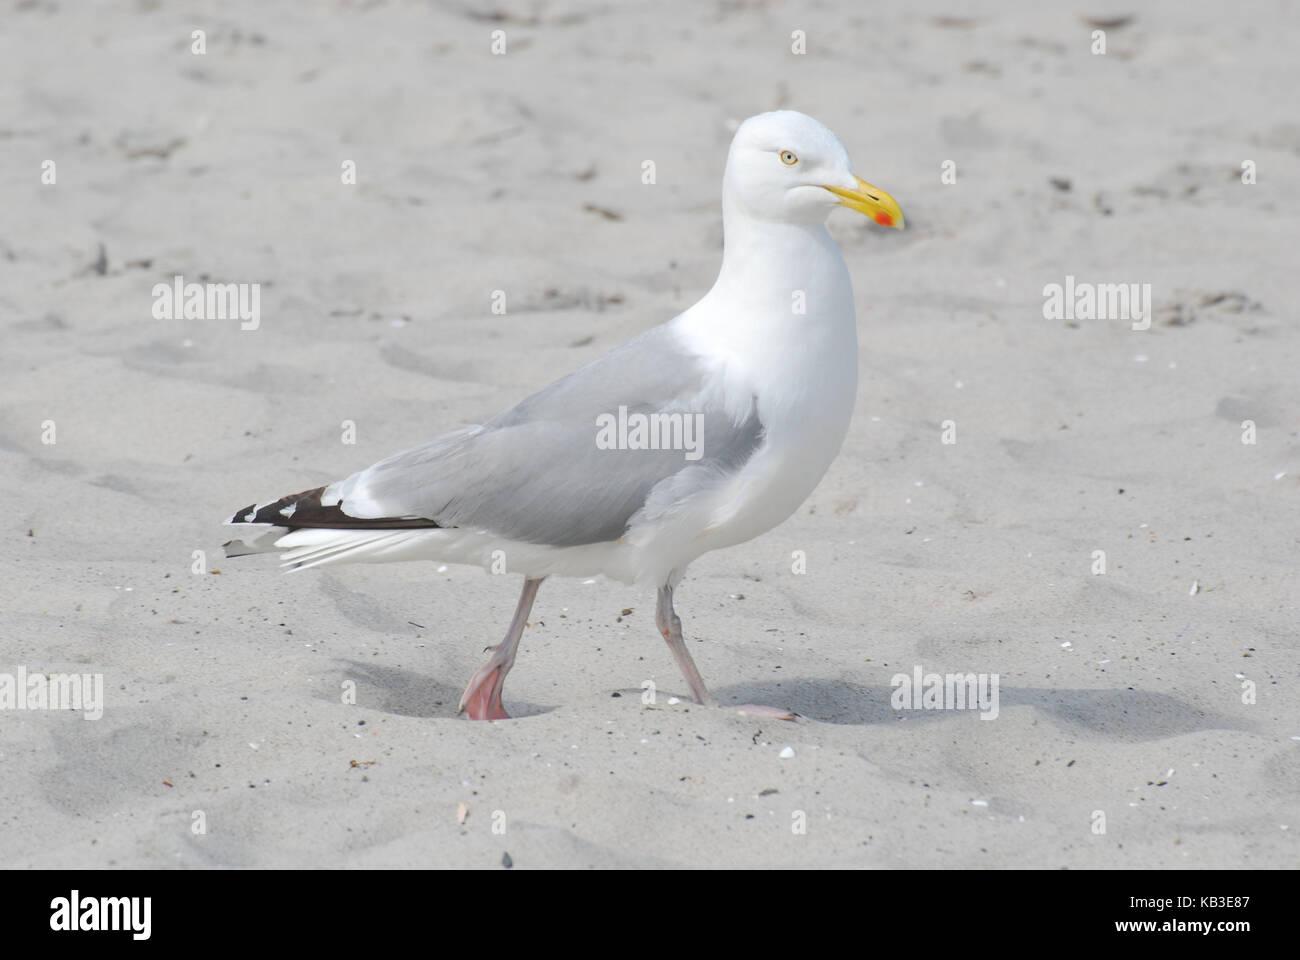 Ornithology, sea bird, Mediterranean gull, Sand - Stock Image